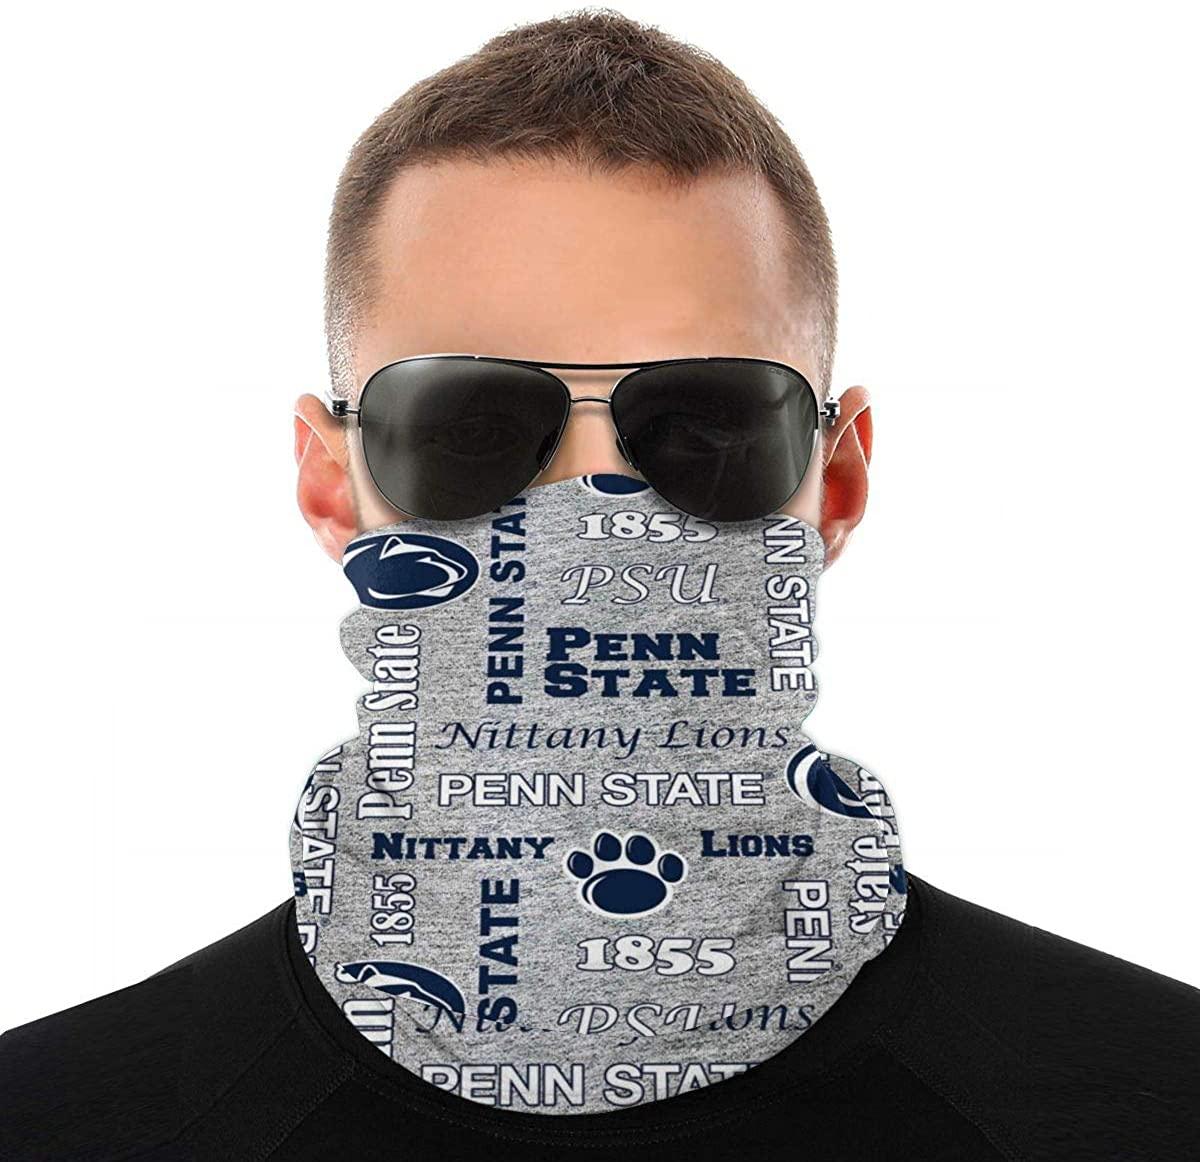 Texas A&M University Neck Gaiter Bandana Sports Face Mask Scarf Sun Protection Headwear Headband for Outdoors